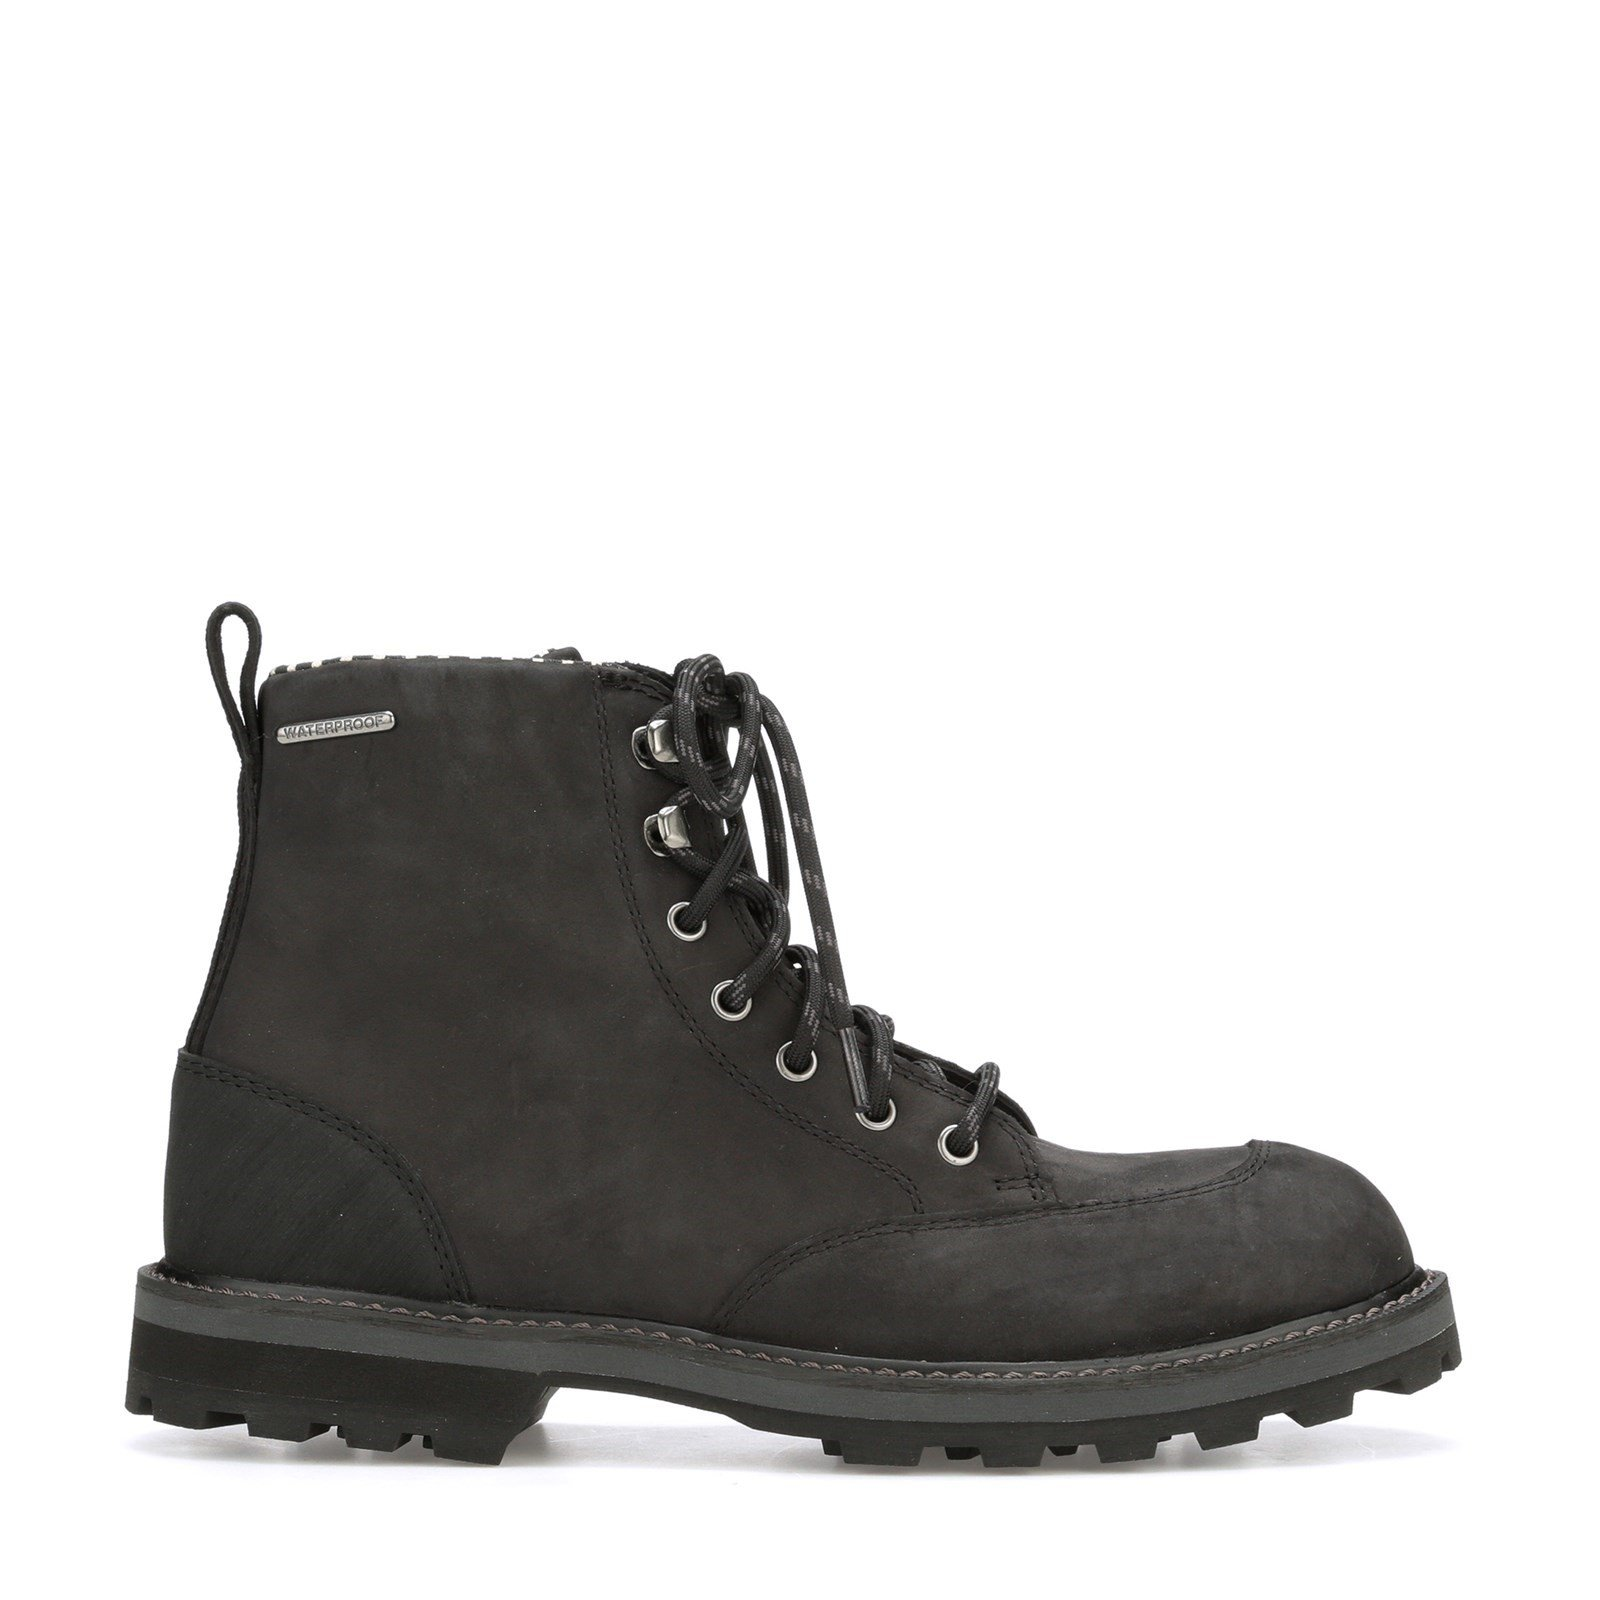 Muck Boots Men's Foreman Boot Black 31854 - Black 13